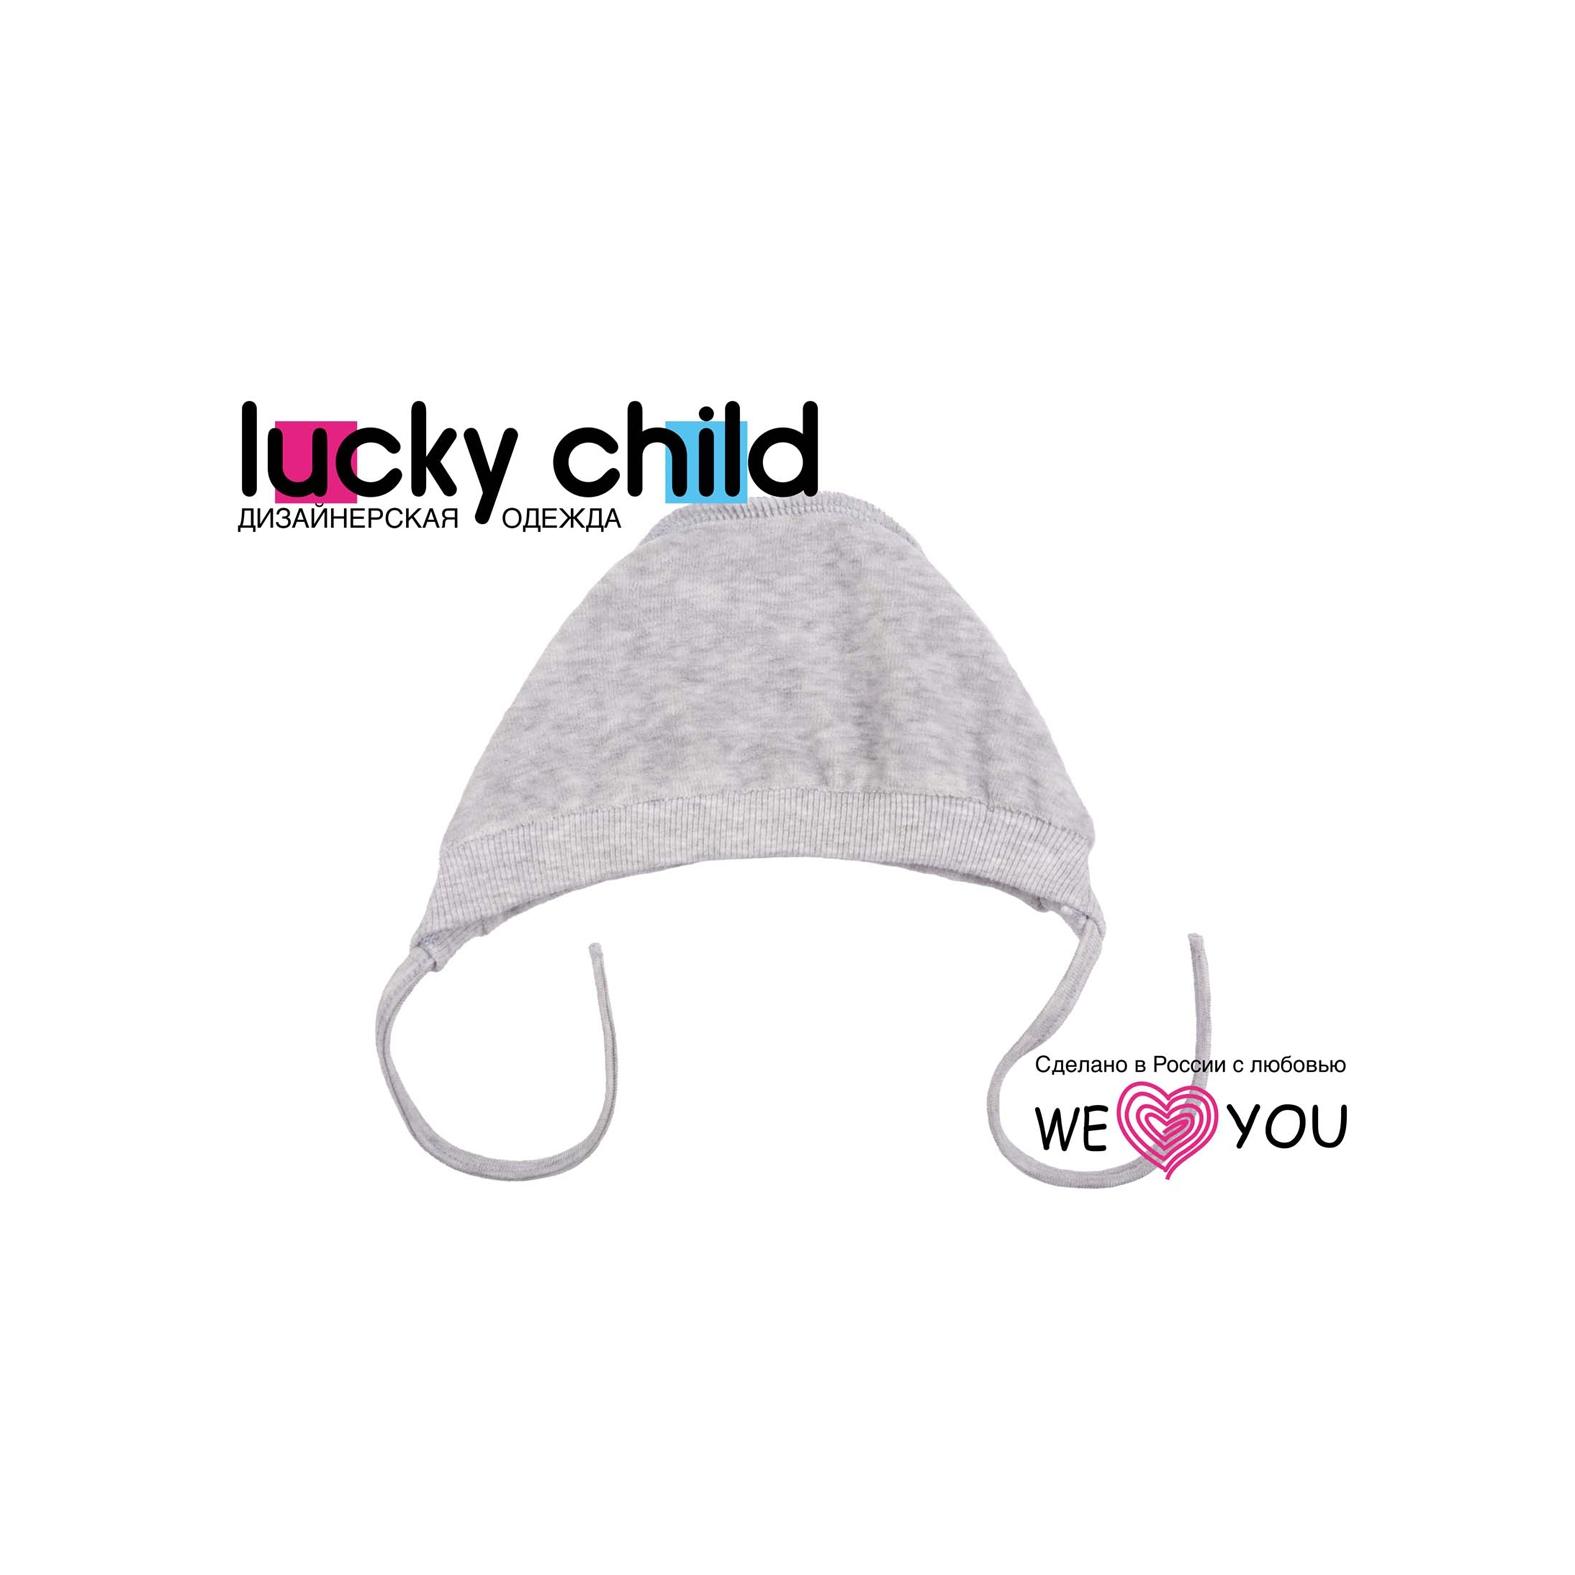 Чепчик из велюра Lucky Child, цвет серый размер 47<br>